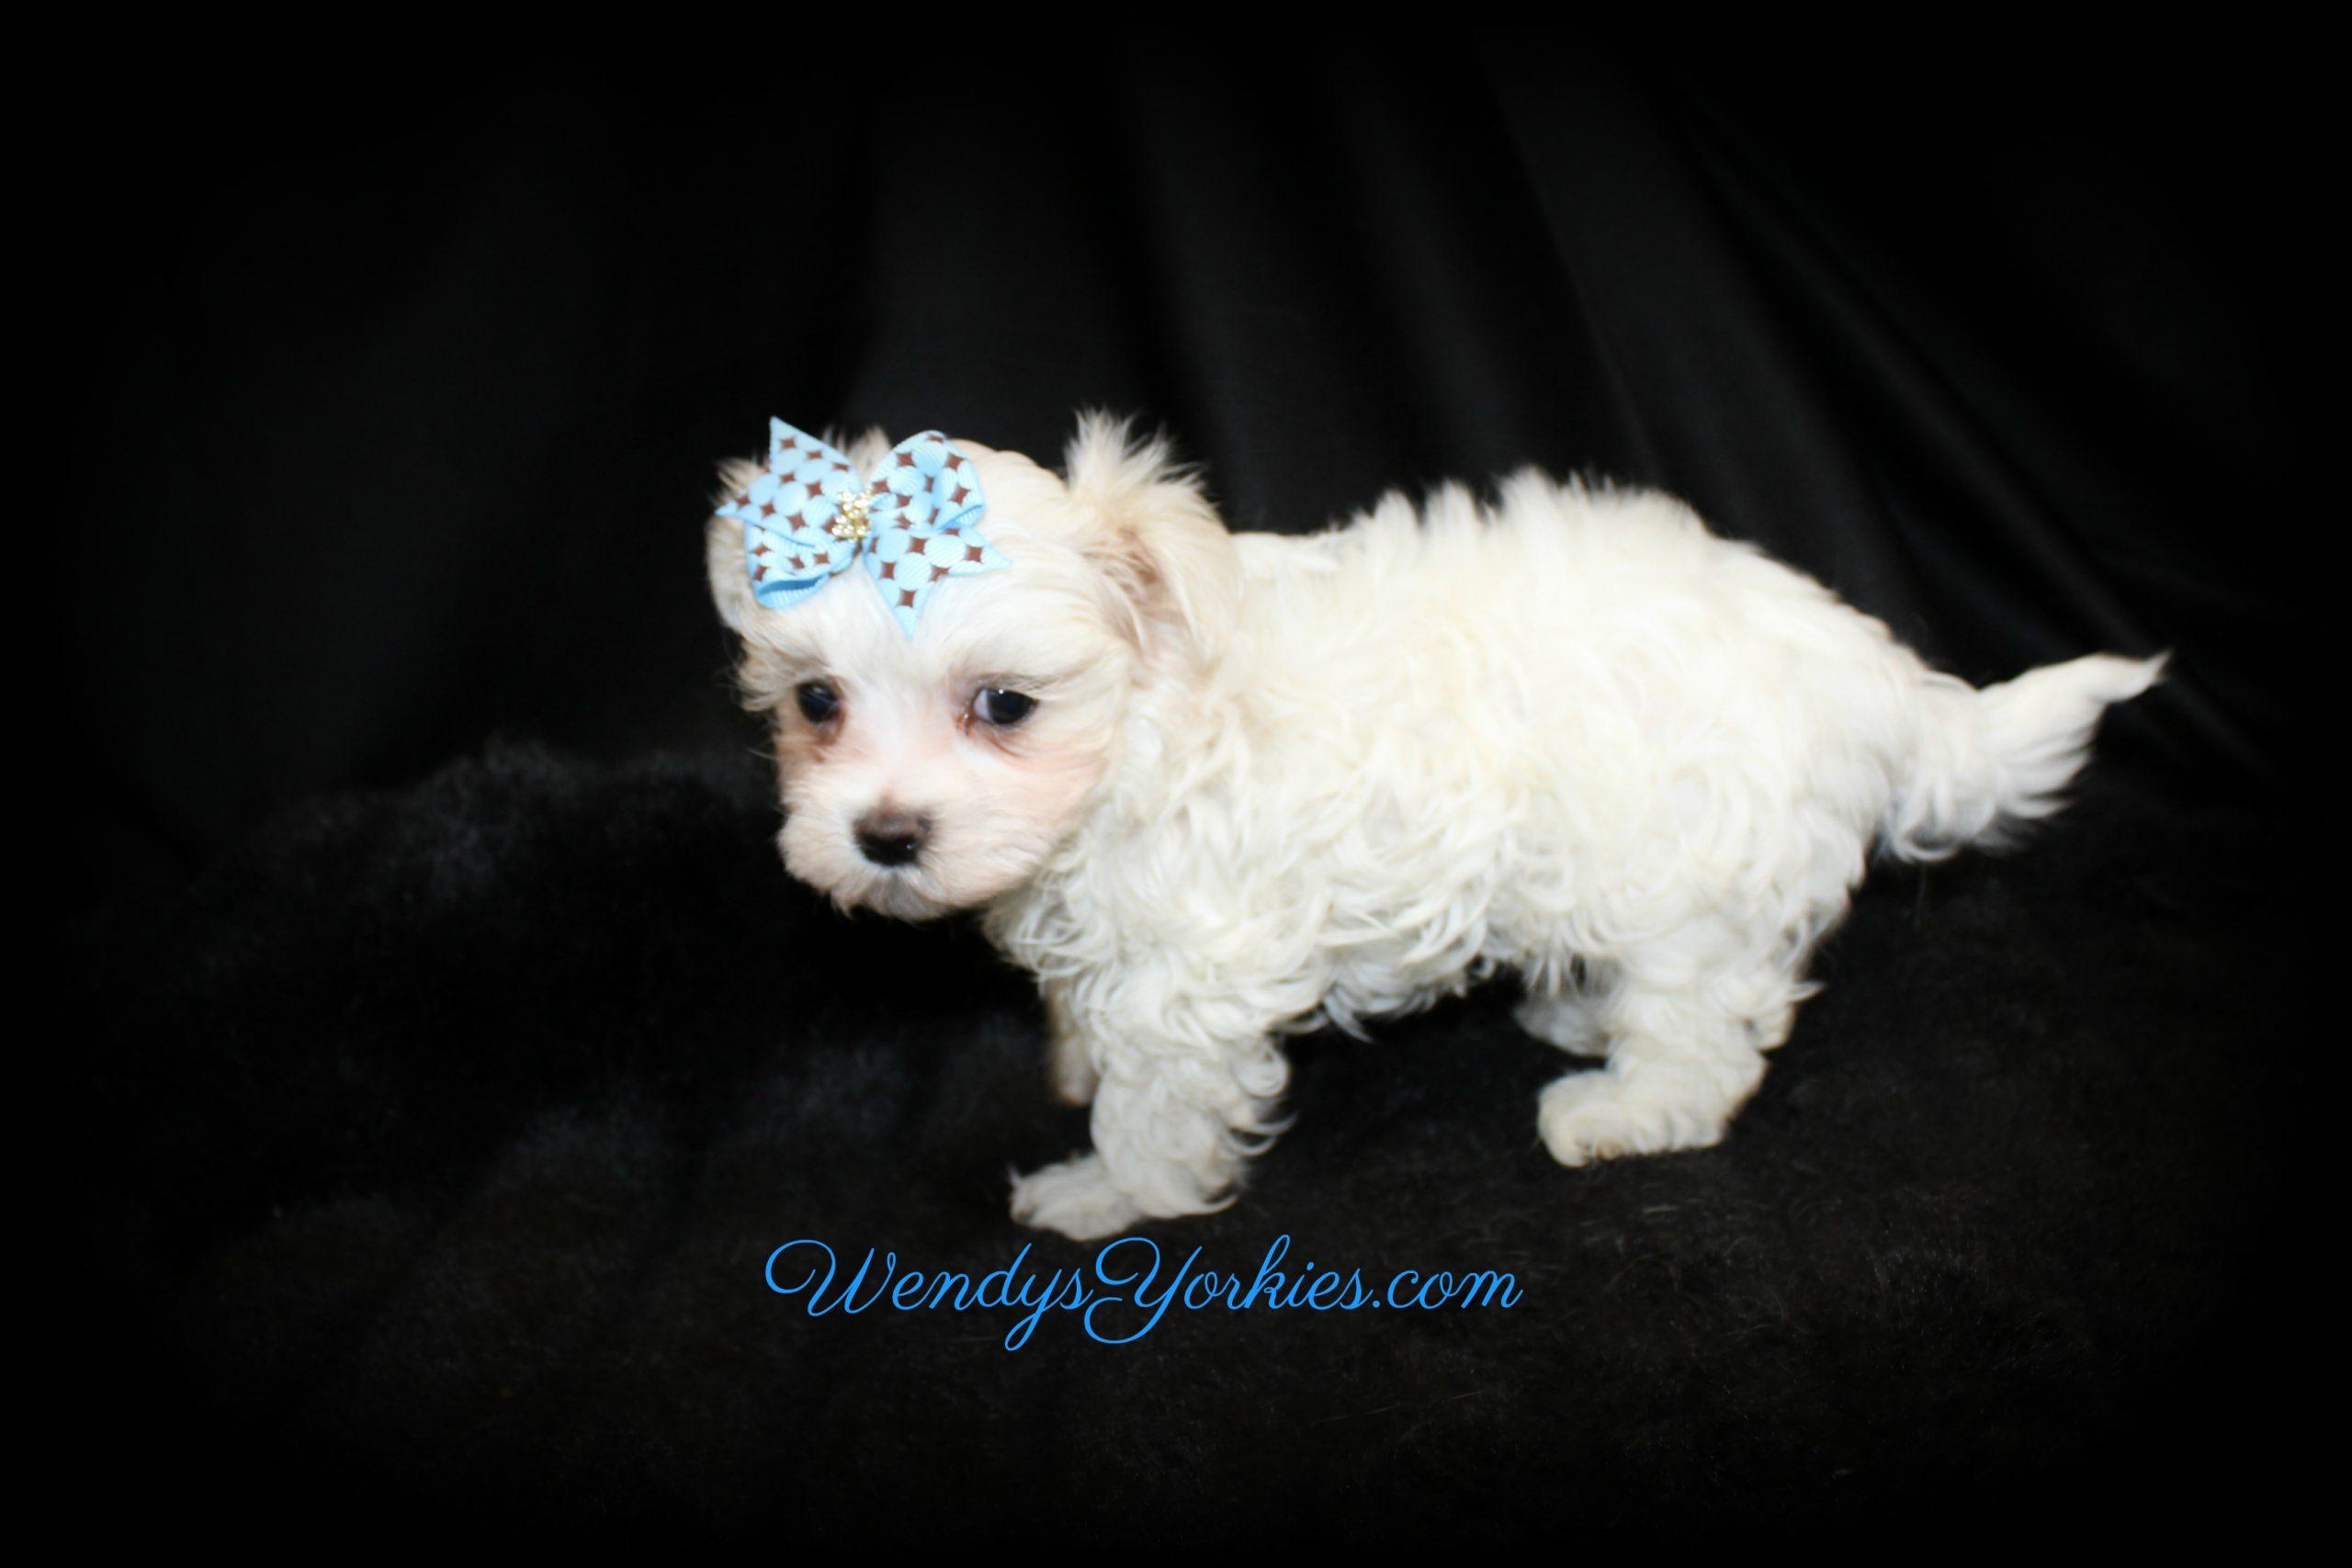 Maltese puppy Zeus, WendysYorkies.com